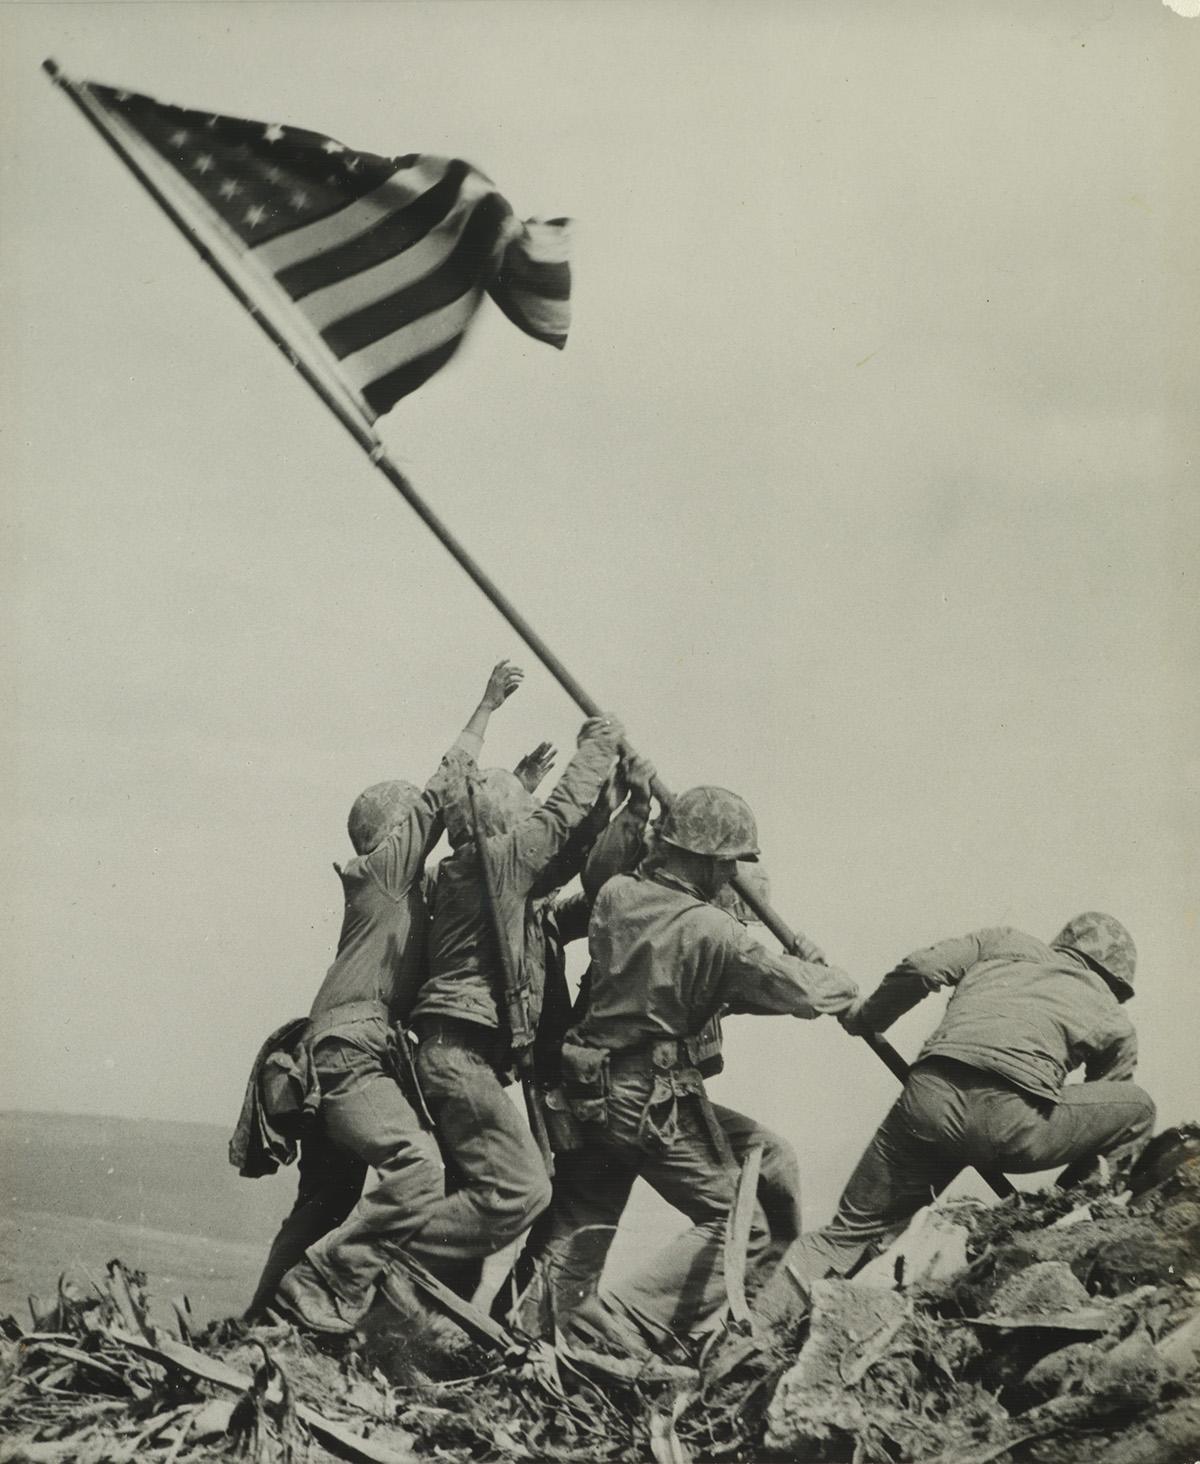 JOE-ROSENTHAL-(1911-2006)-Raising-the-Flag-on-Iwo-Jima